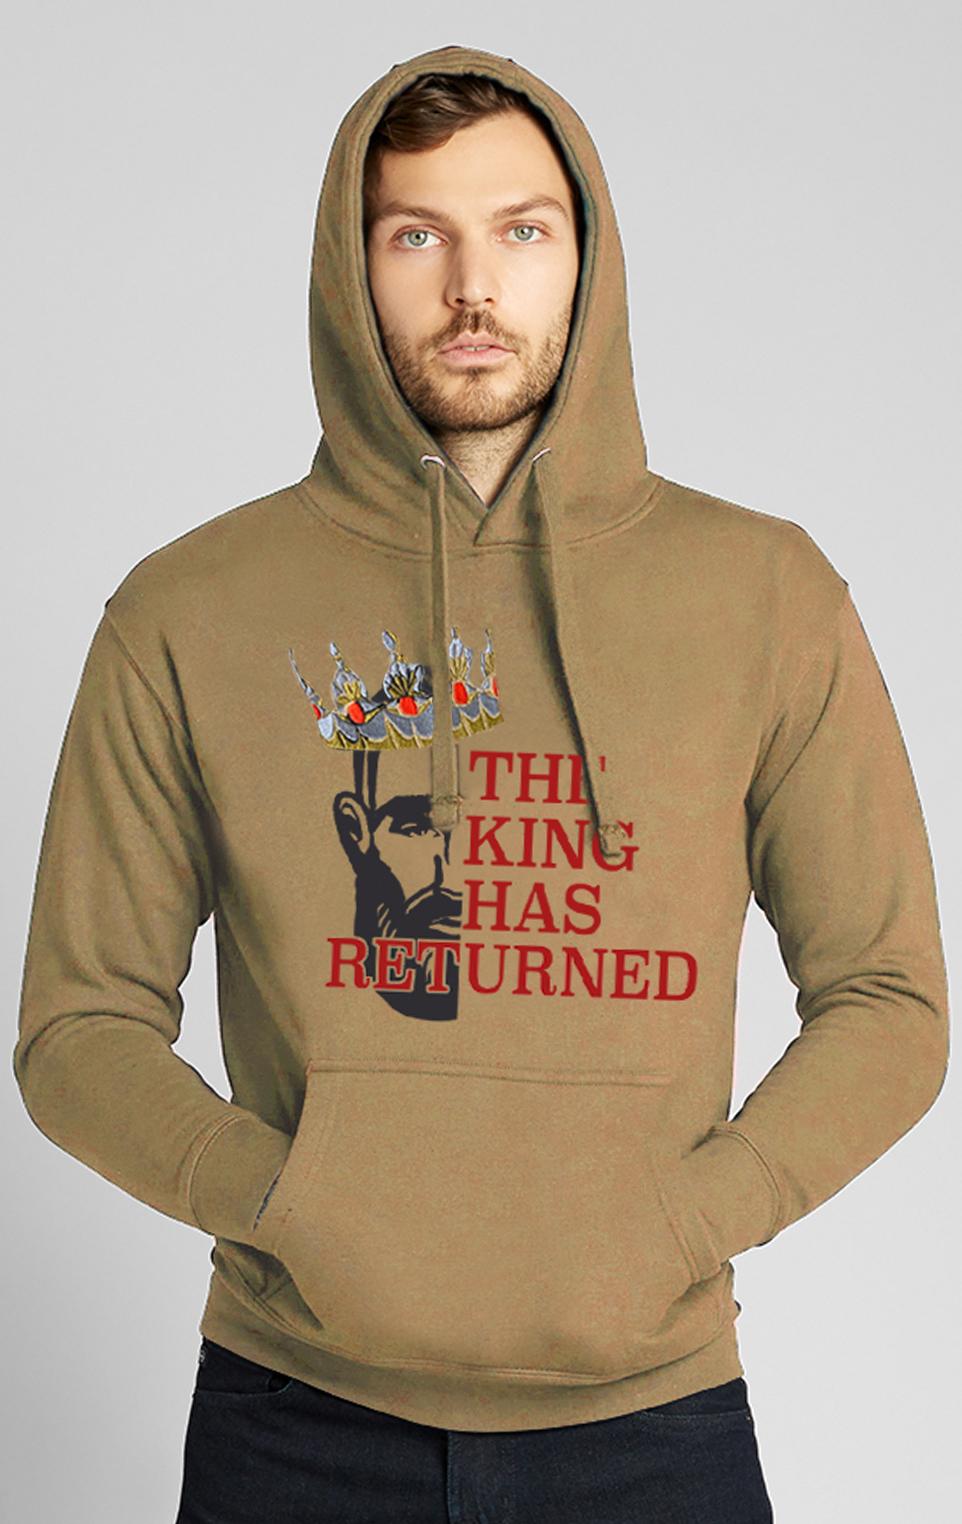 The King Has Returned Hooded Sweatshirt in Khaki